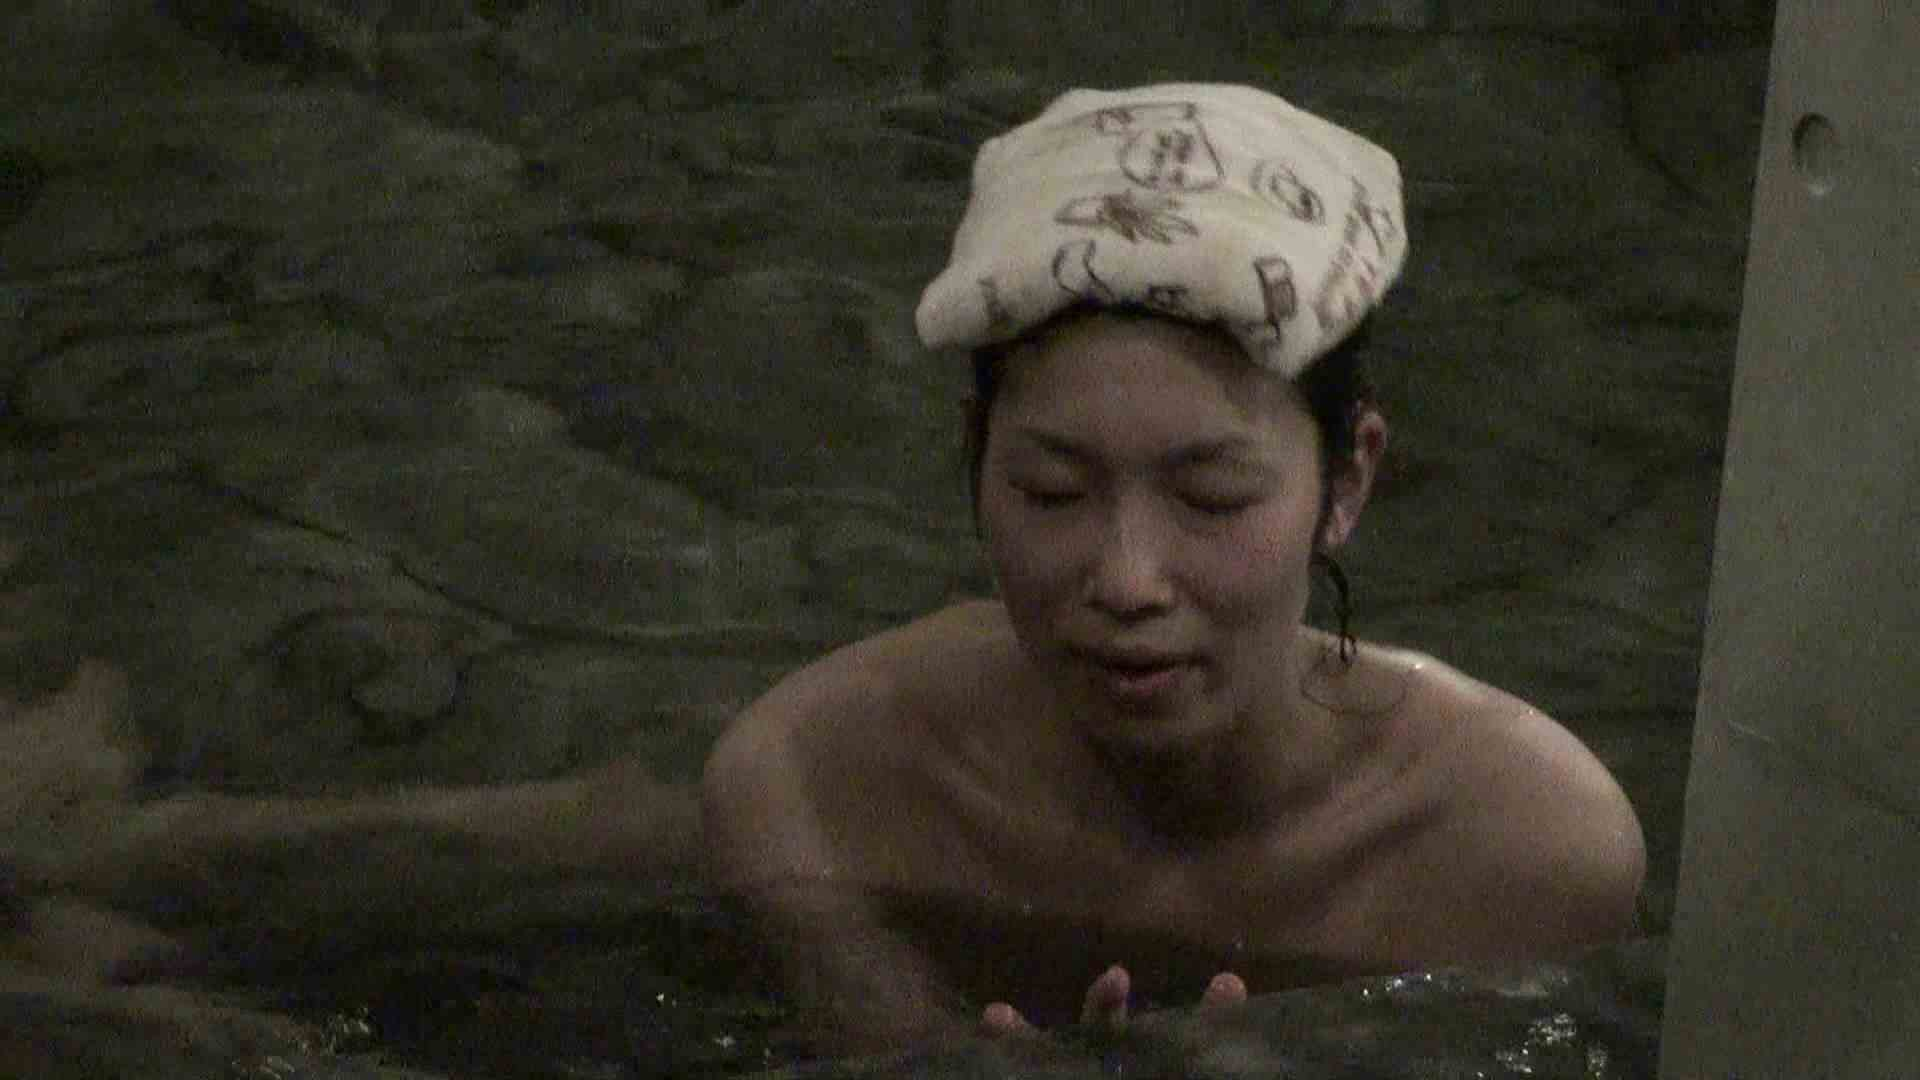 Aquaな露天風呂Vol.399 0   0  81連発 43